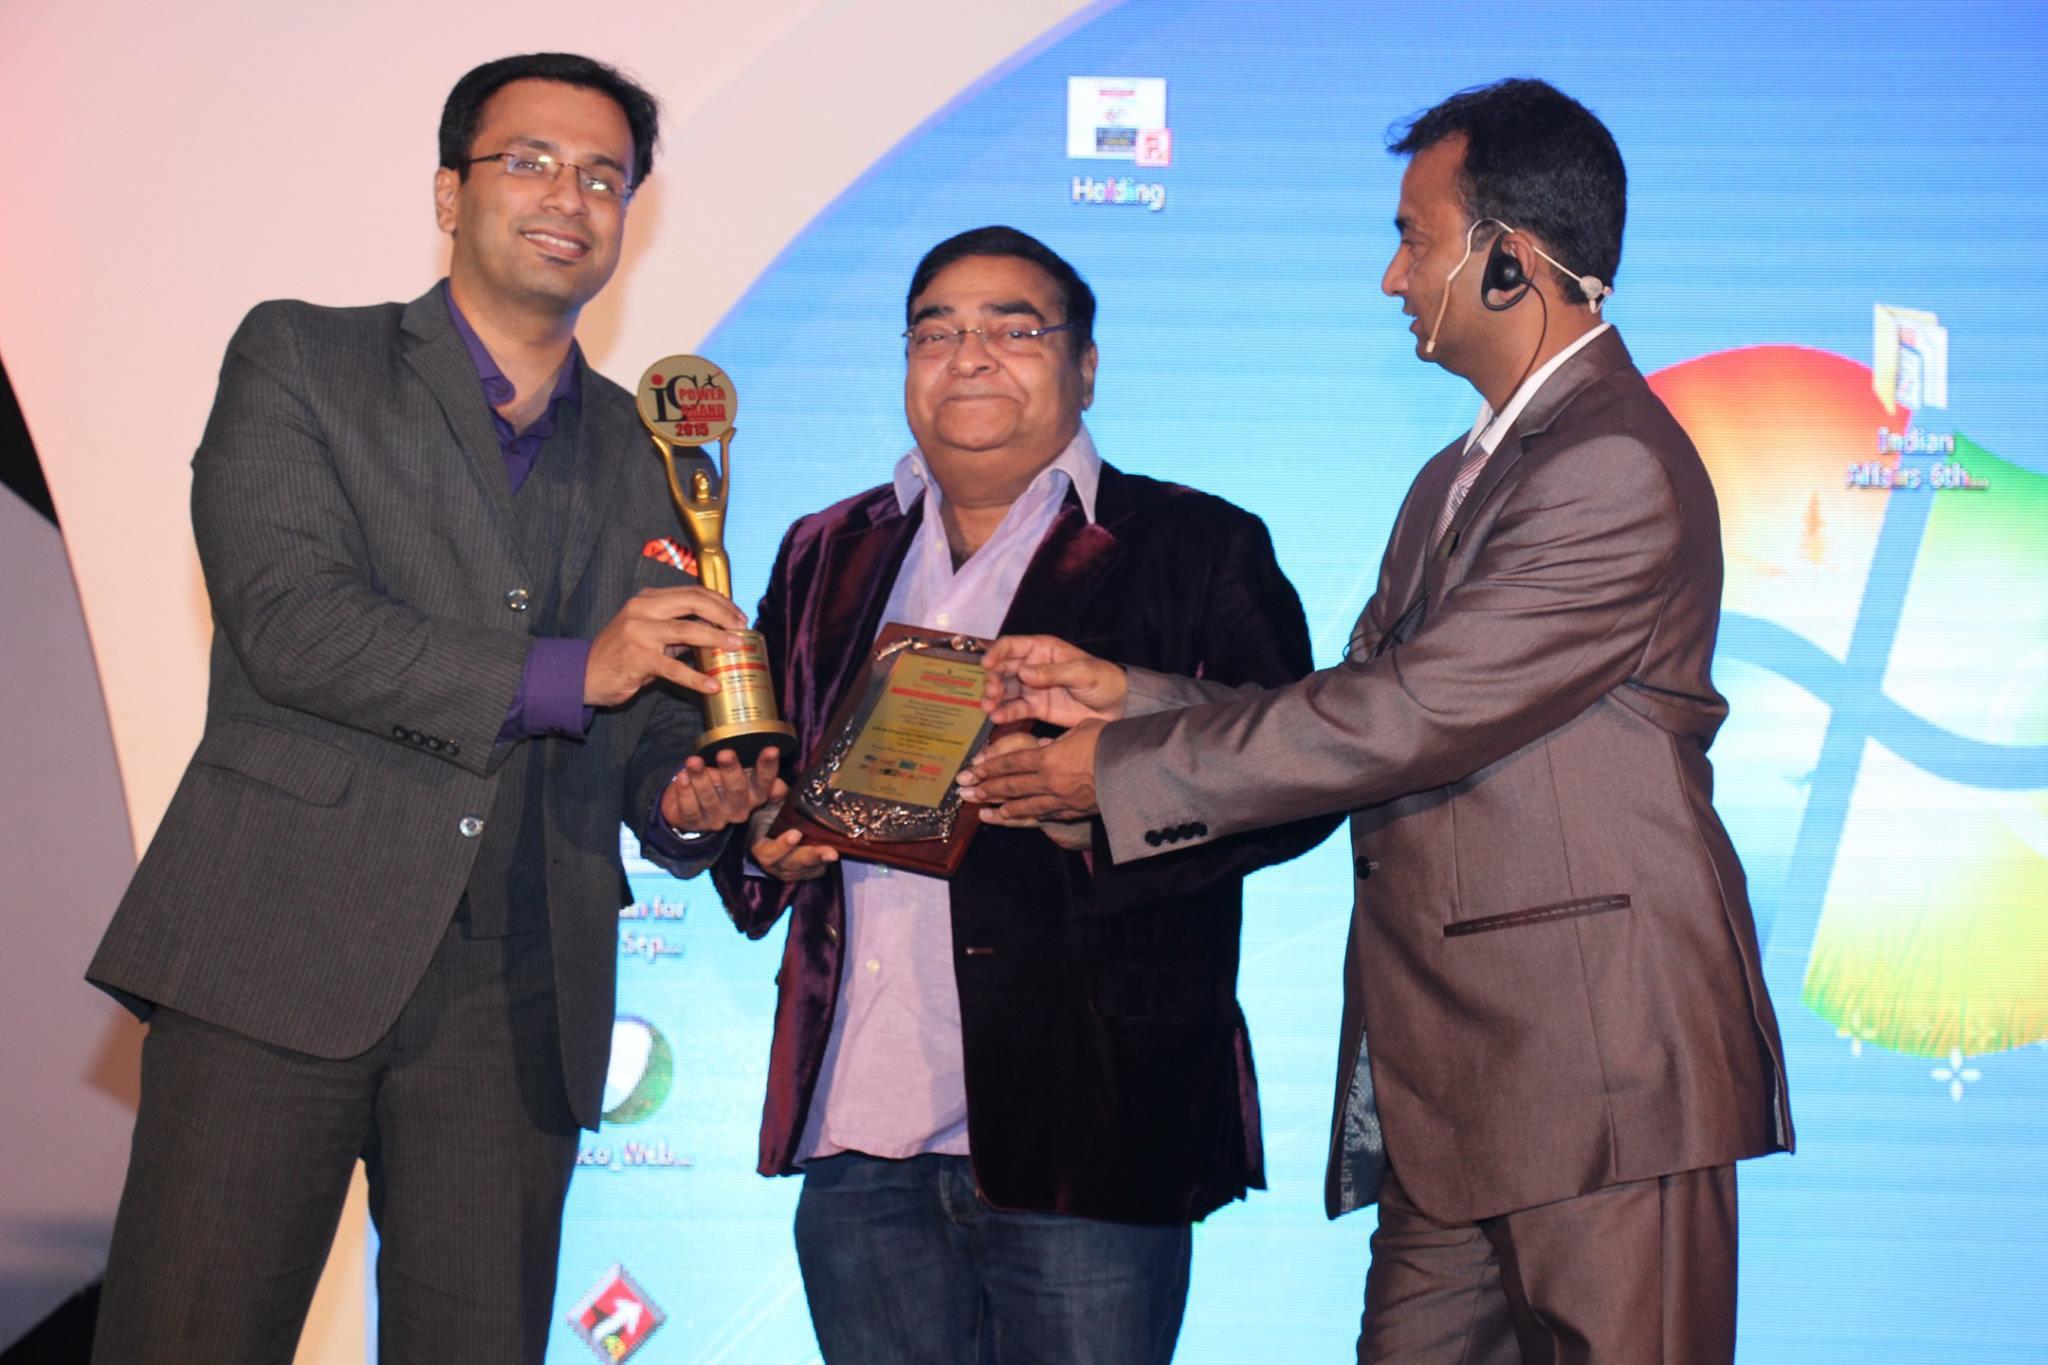 Dr. award